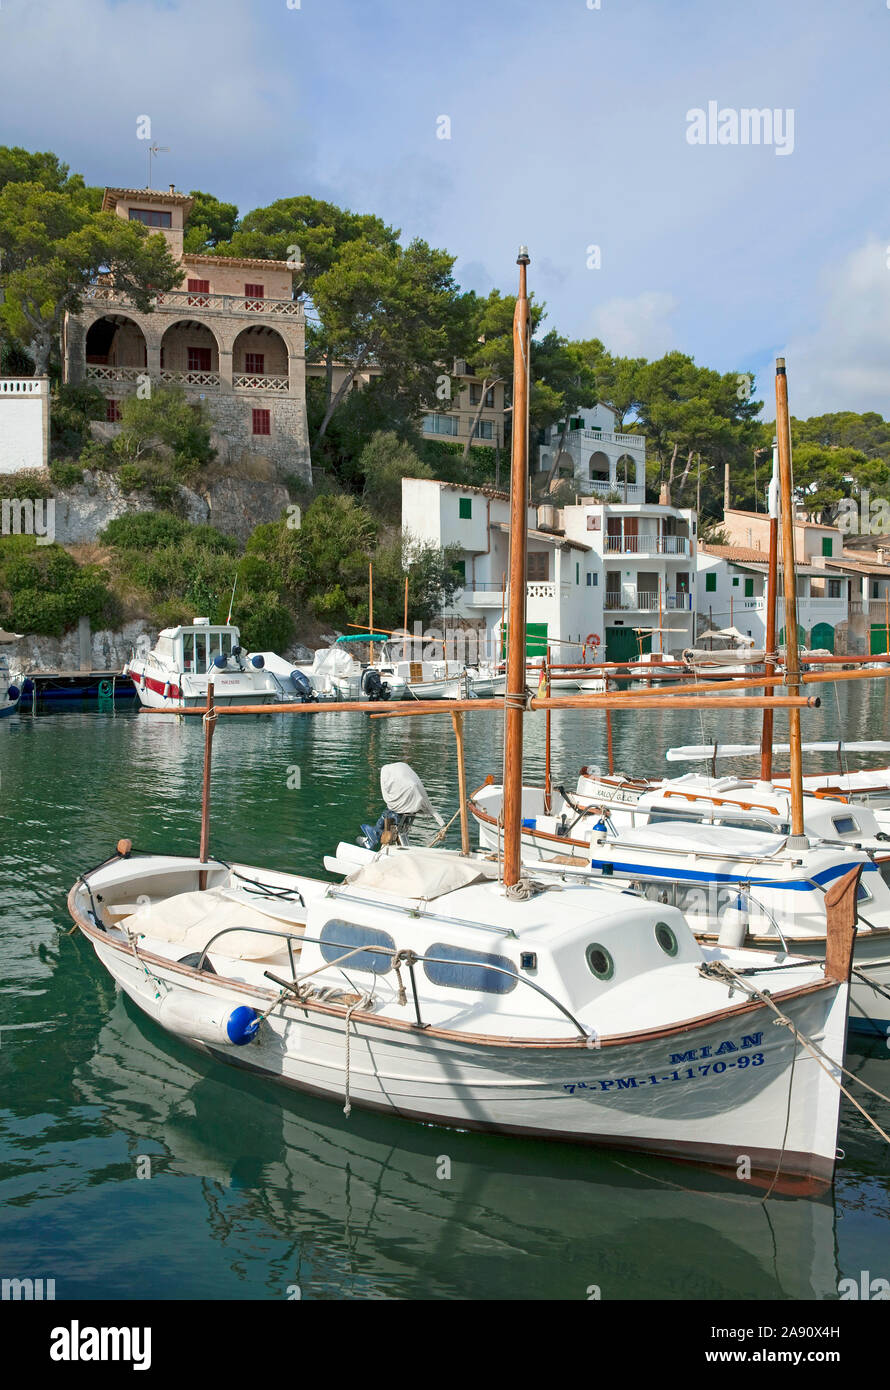 Cala Figuera, idyllic fishing village at South-West of Mallorca, Balearic islands, Spain Stock Photo